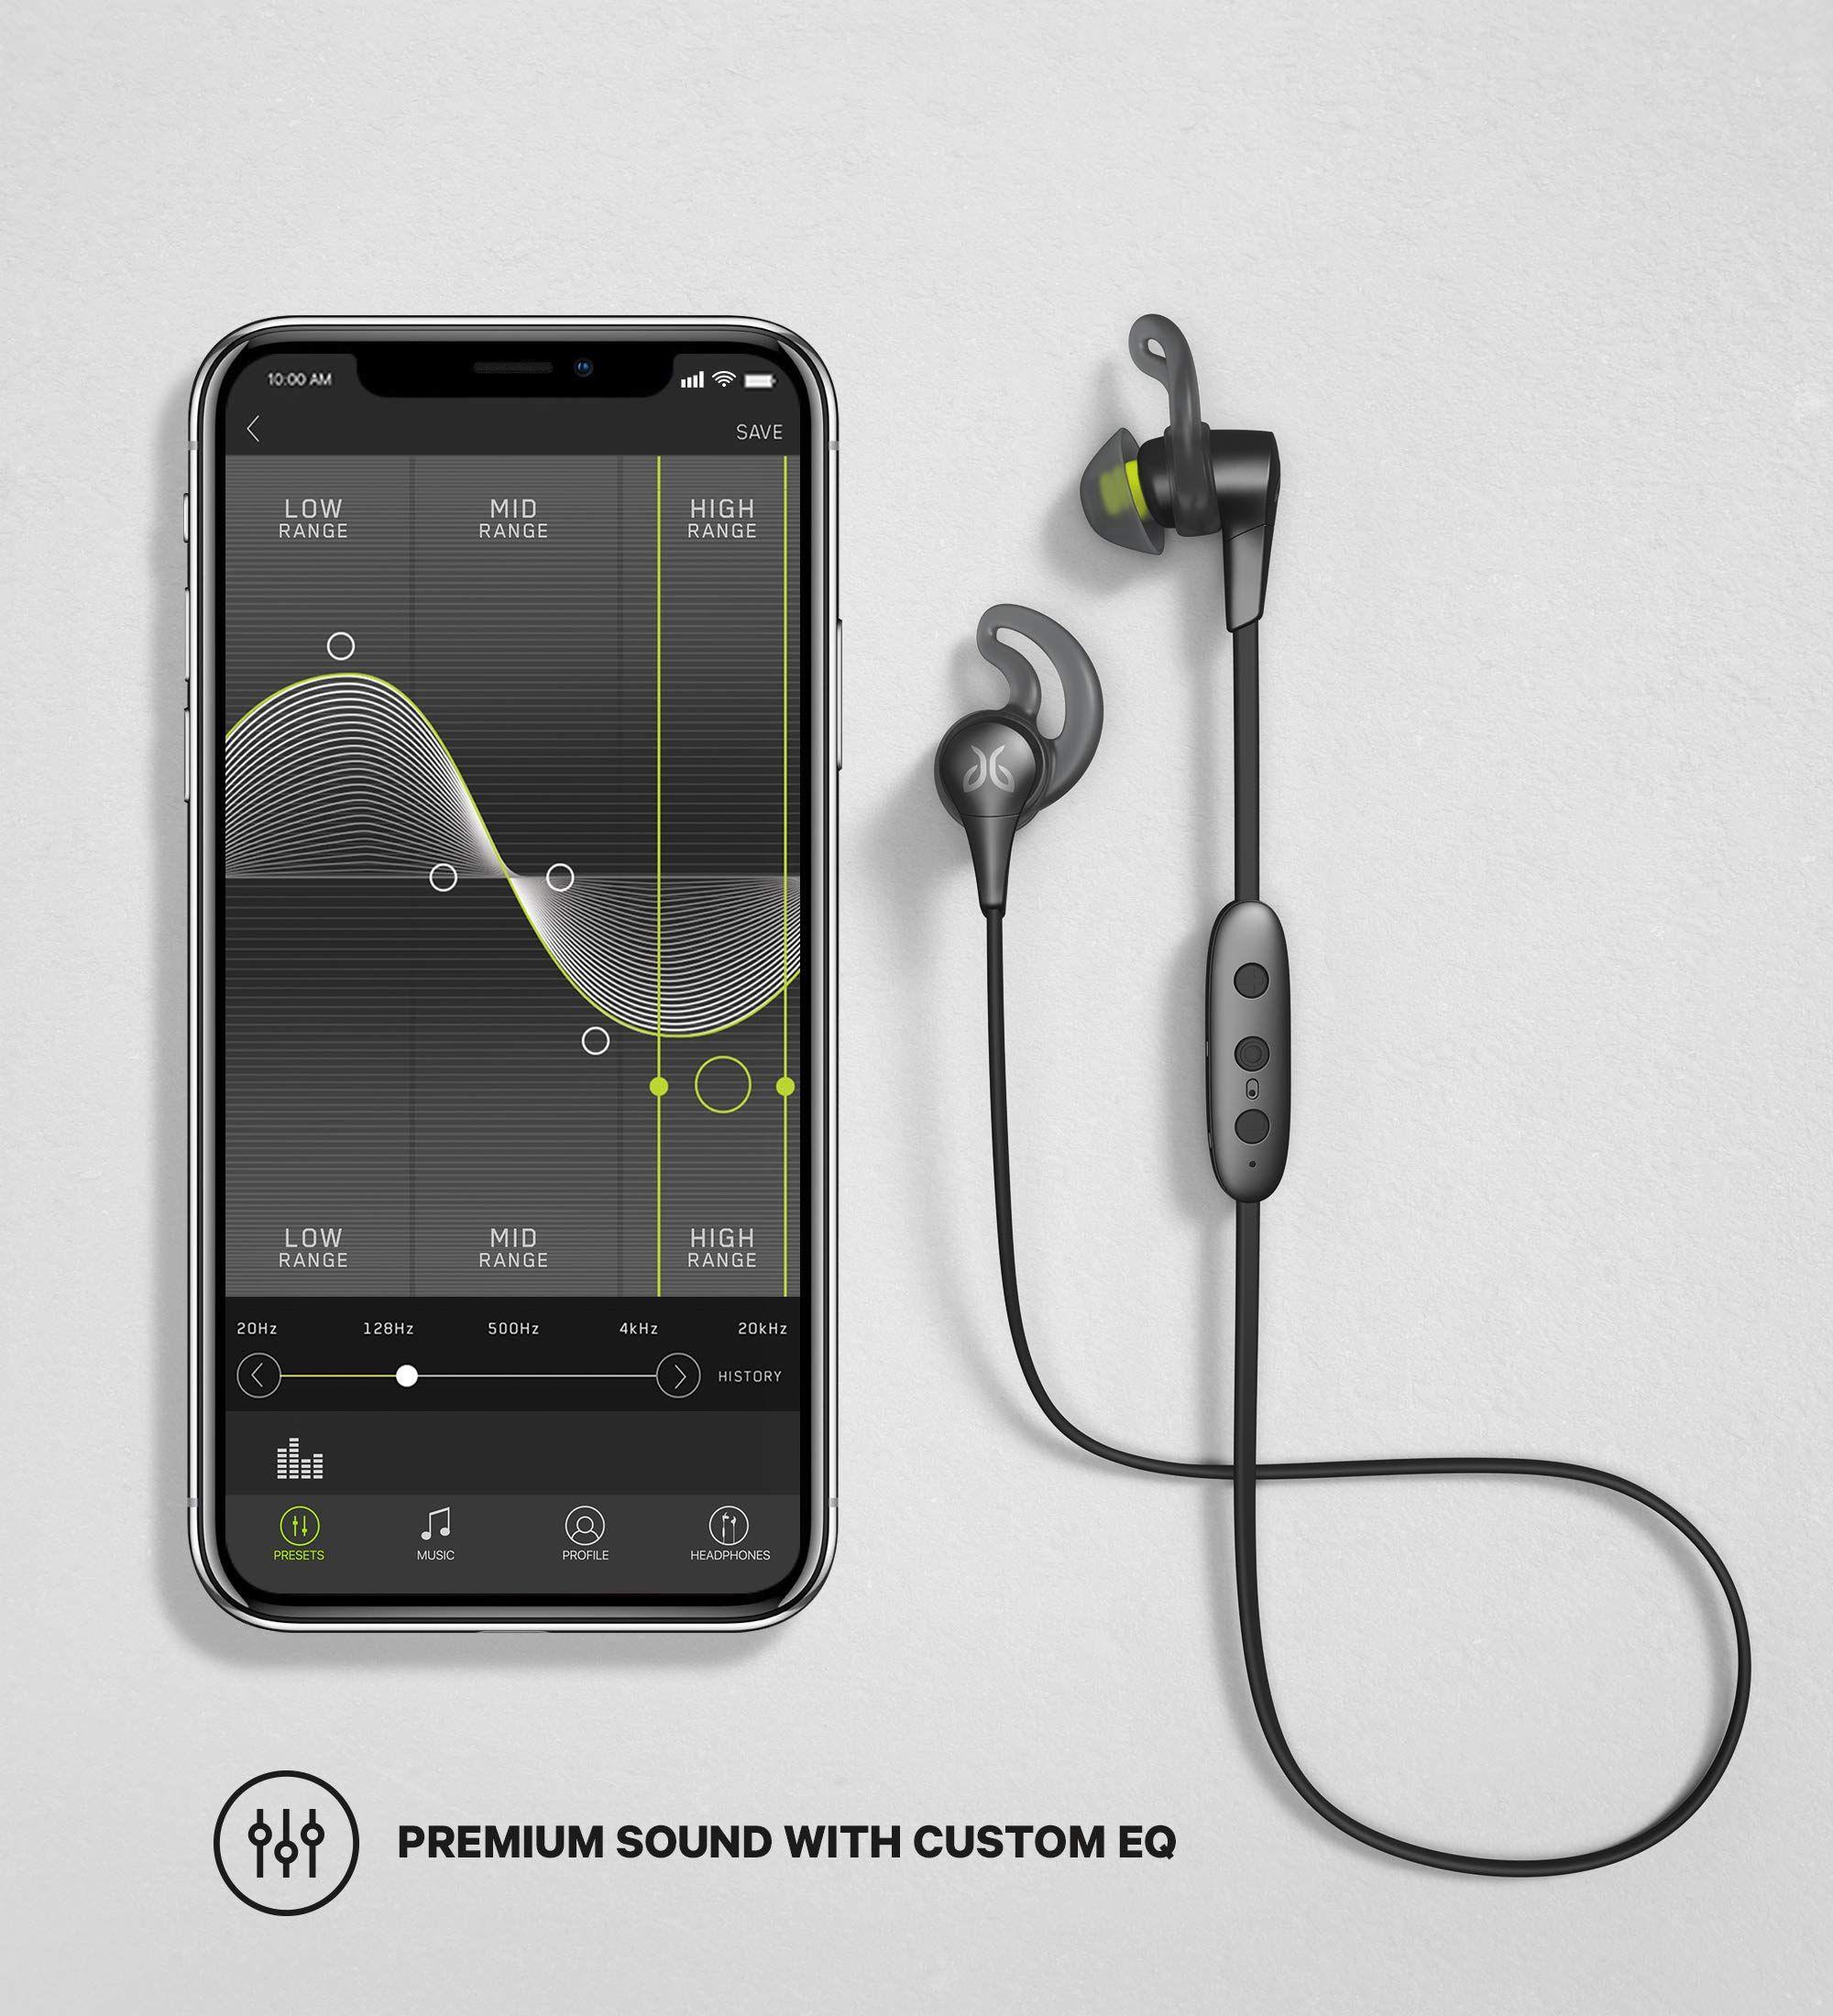 free shipping 2f3f9 f09b7 Jaybird X4 Wireless Bluetooth Headphones for Sport, Fitness and ...